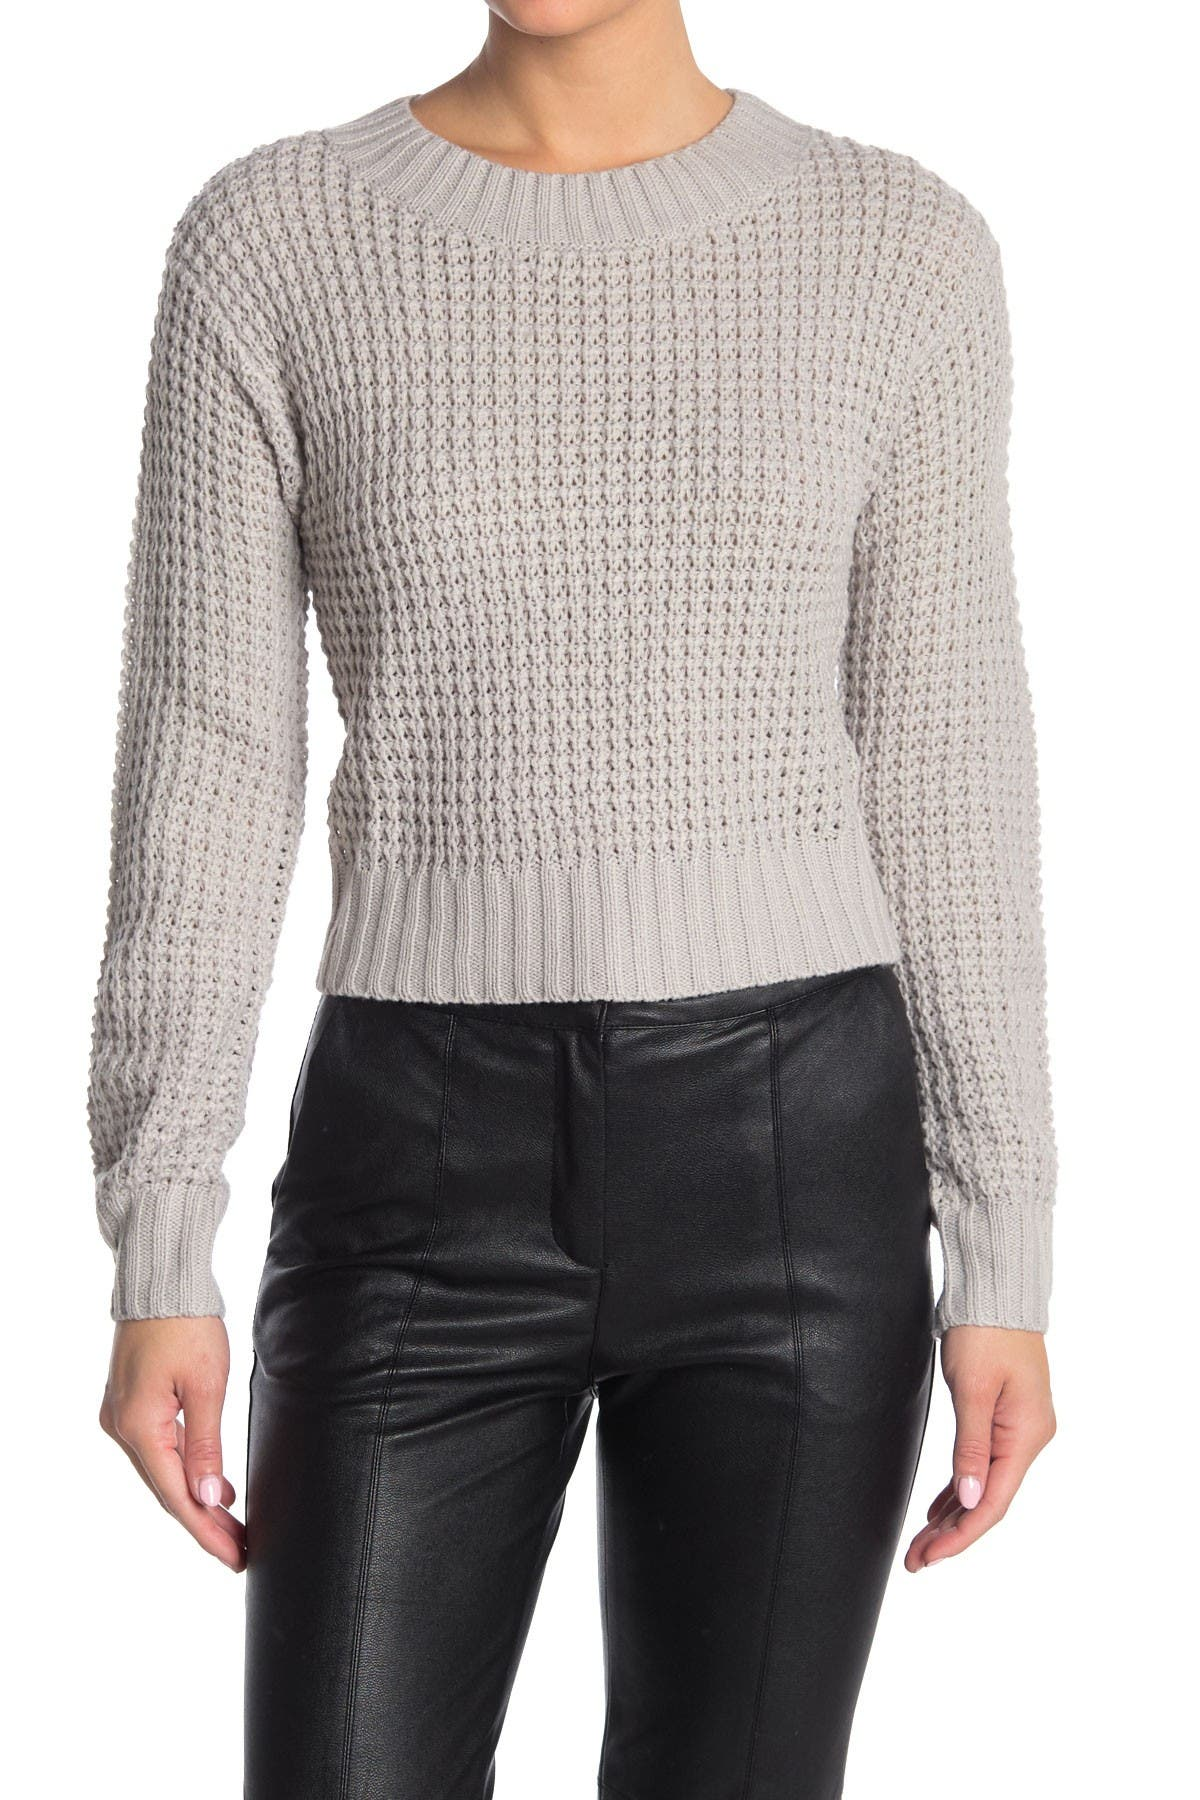 Image of Lush Waffle Knit Cropped Sweater